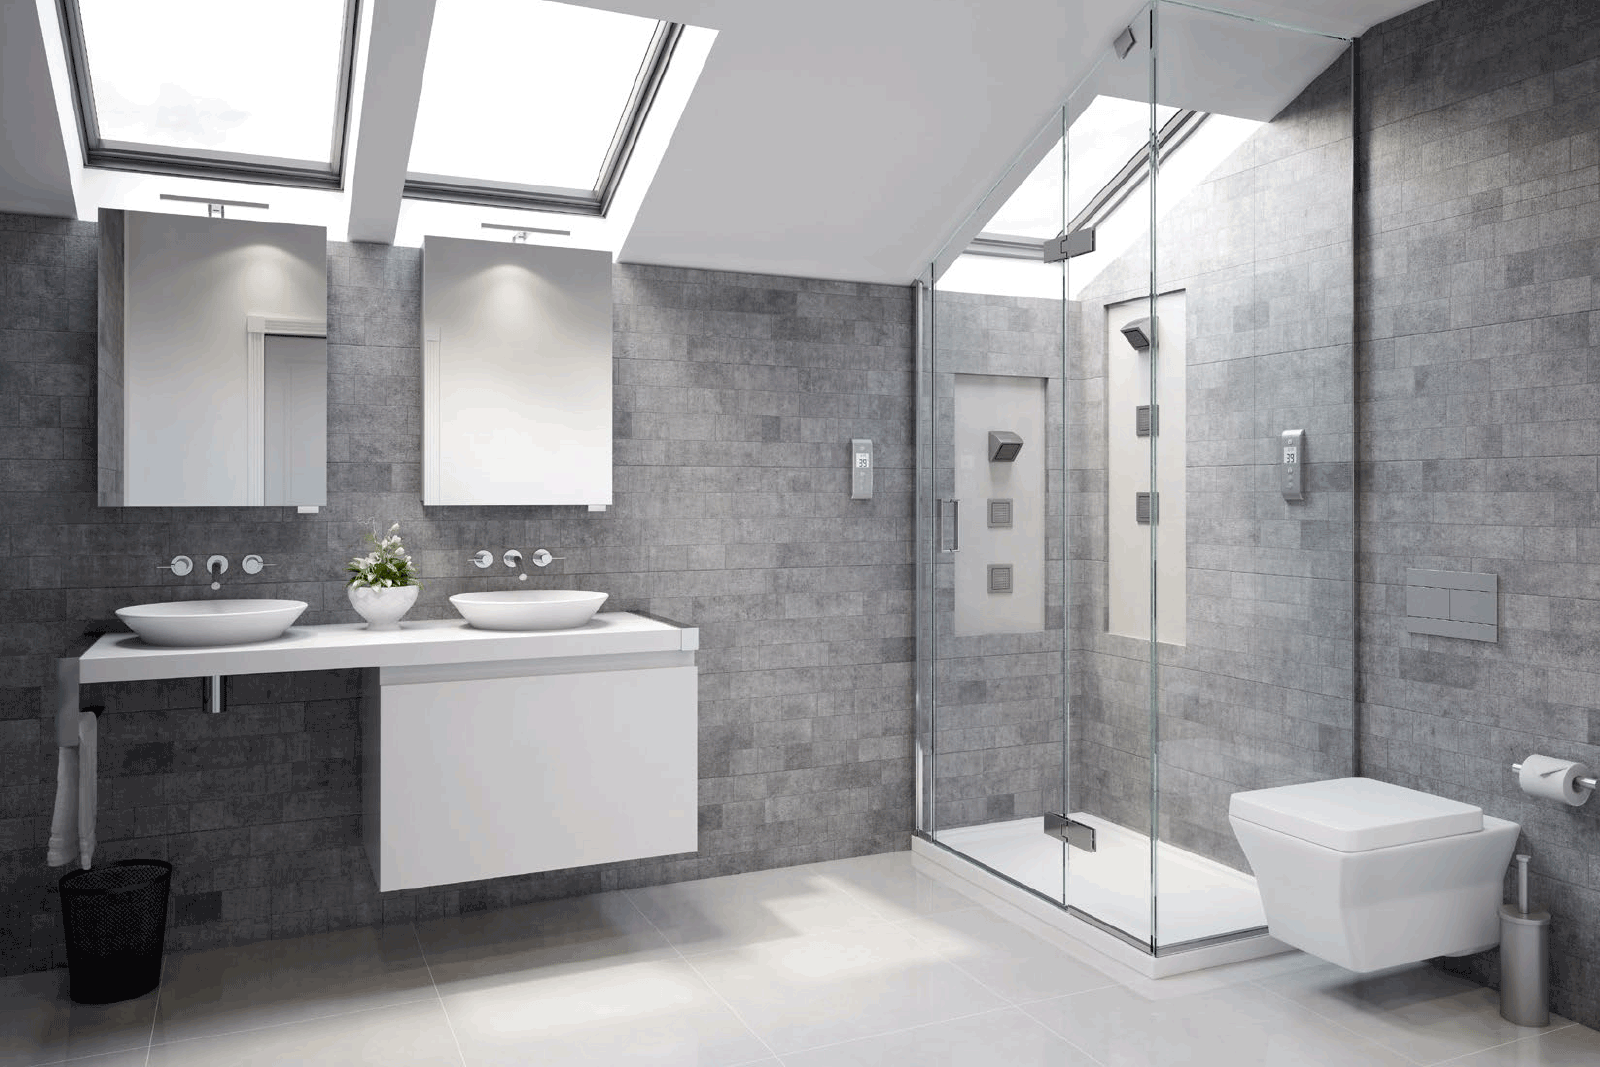 kohler-family-lifestyle-bathroom